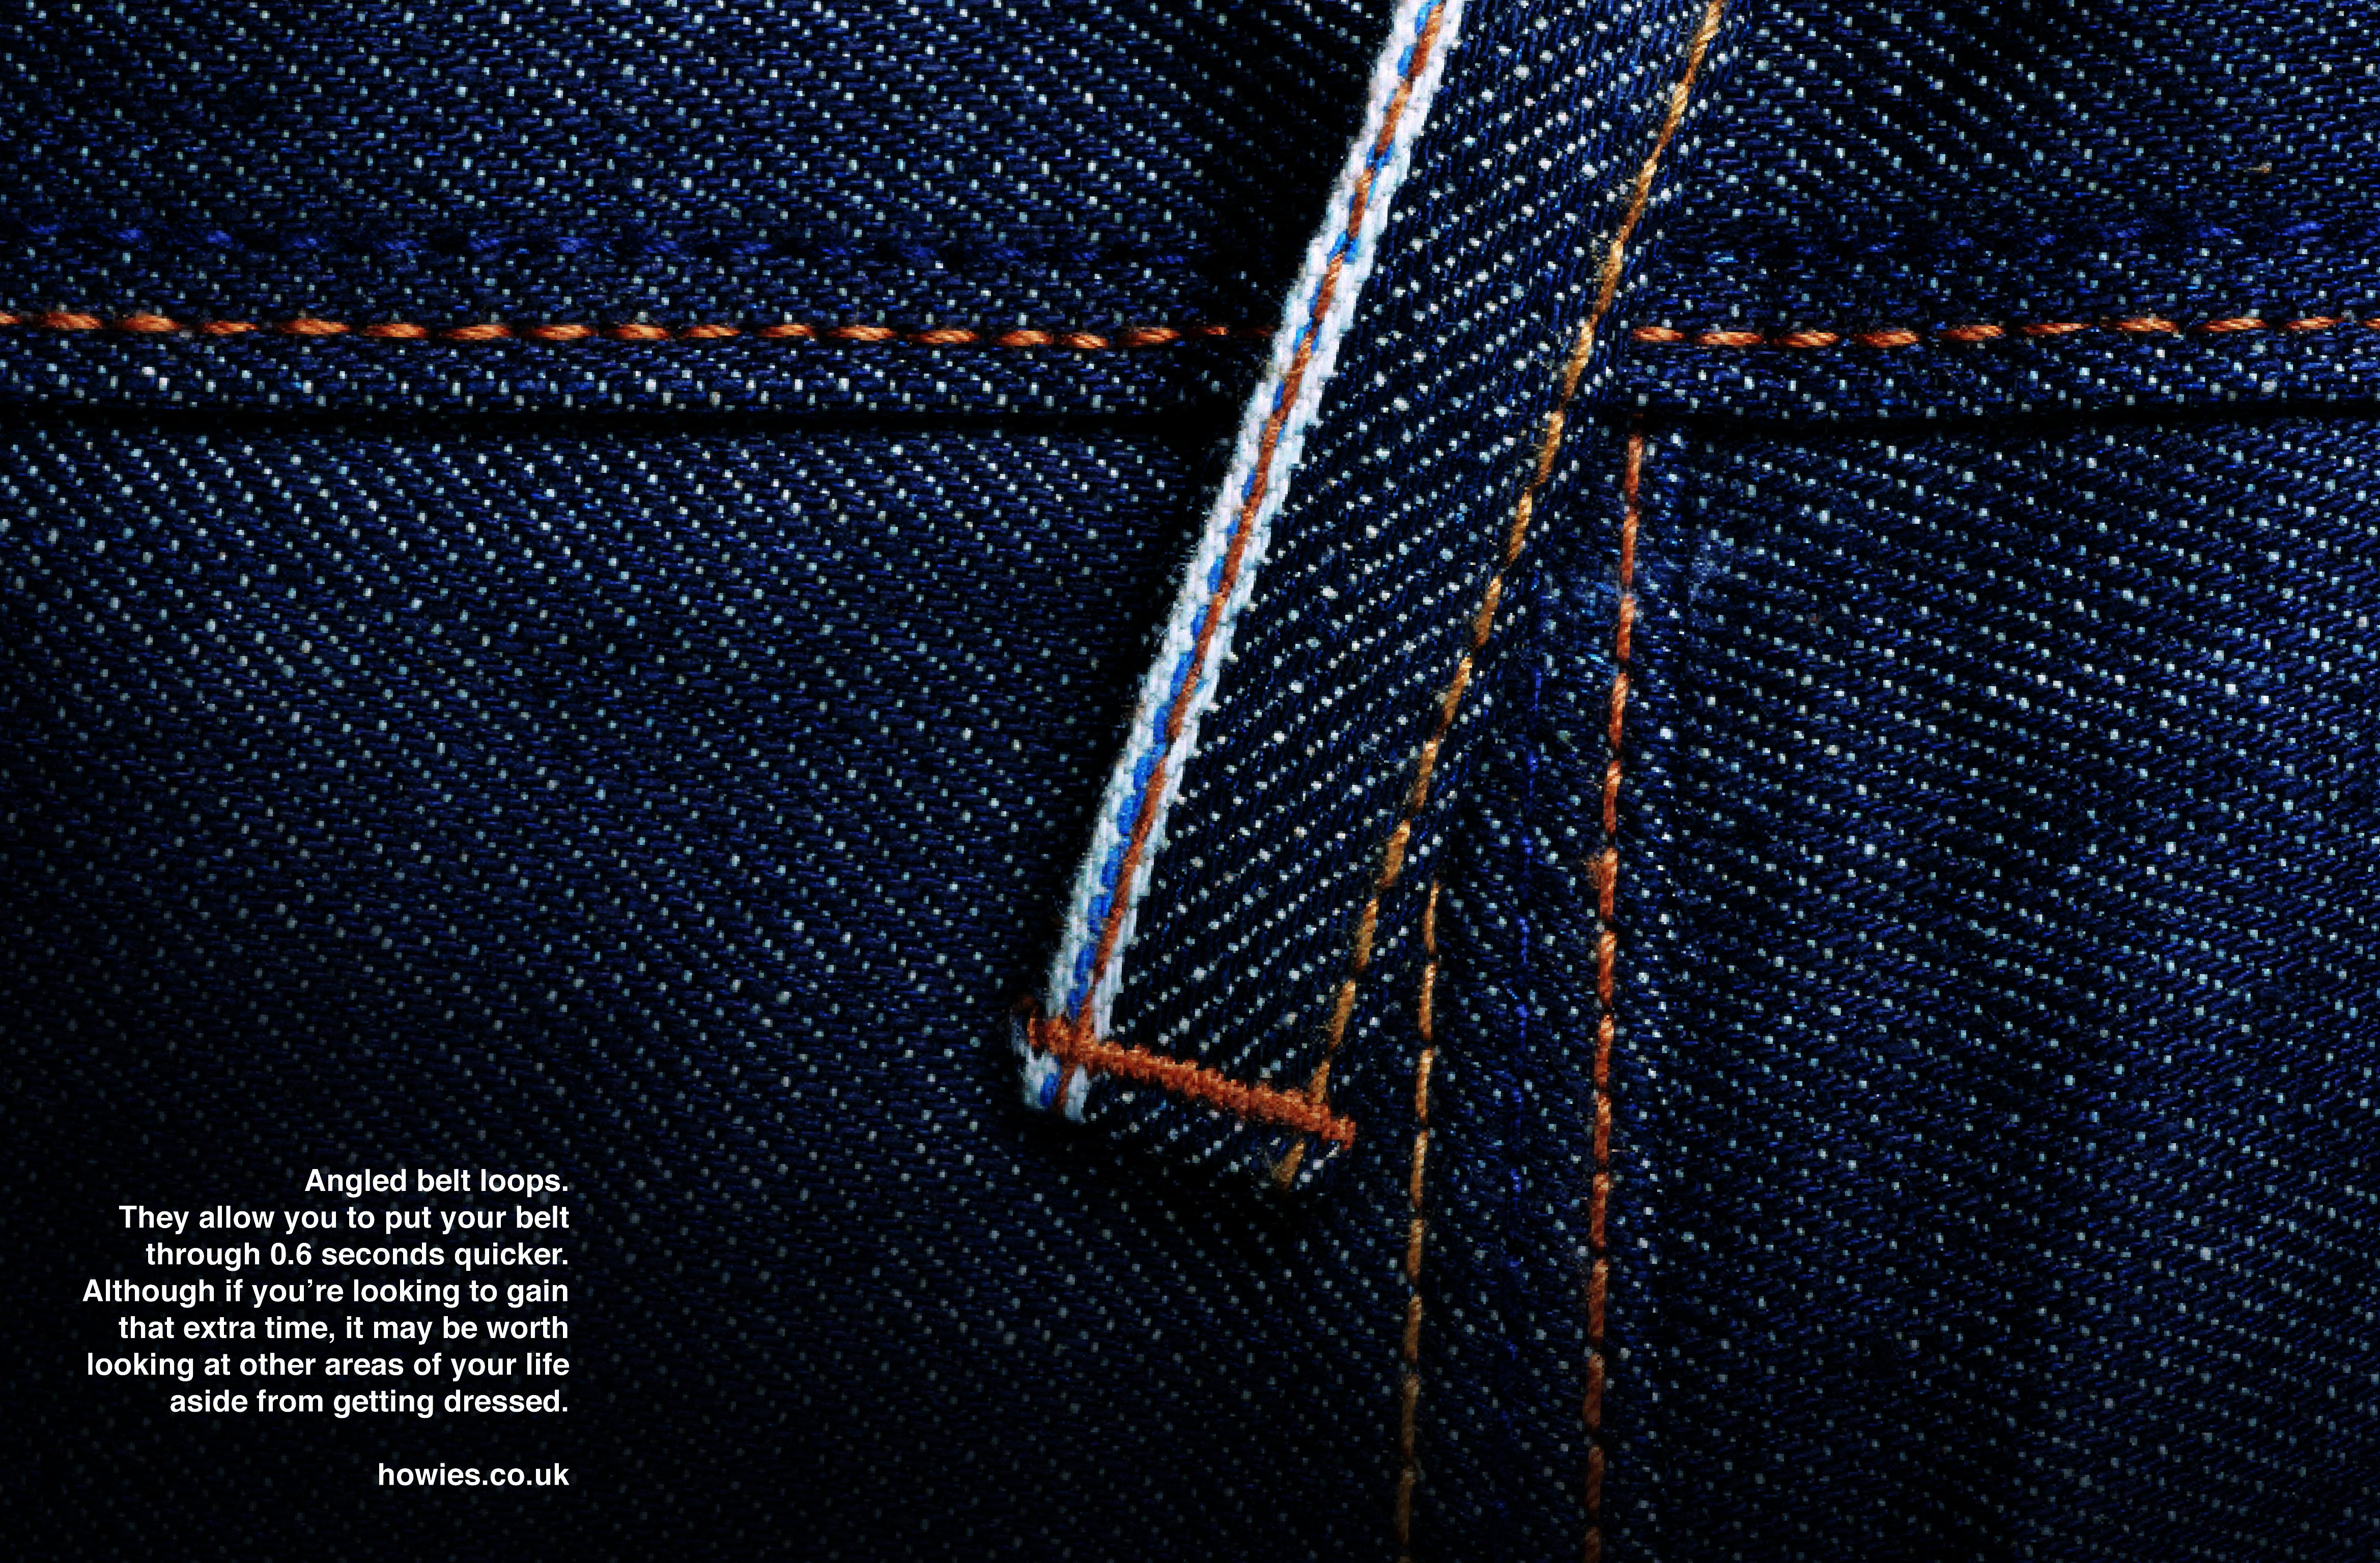 5. 'Angled Belt Loops' Howies, DHM, Final.jpg